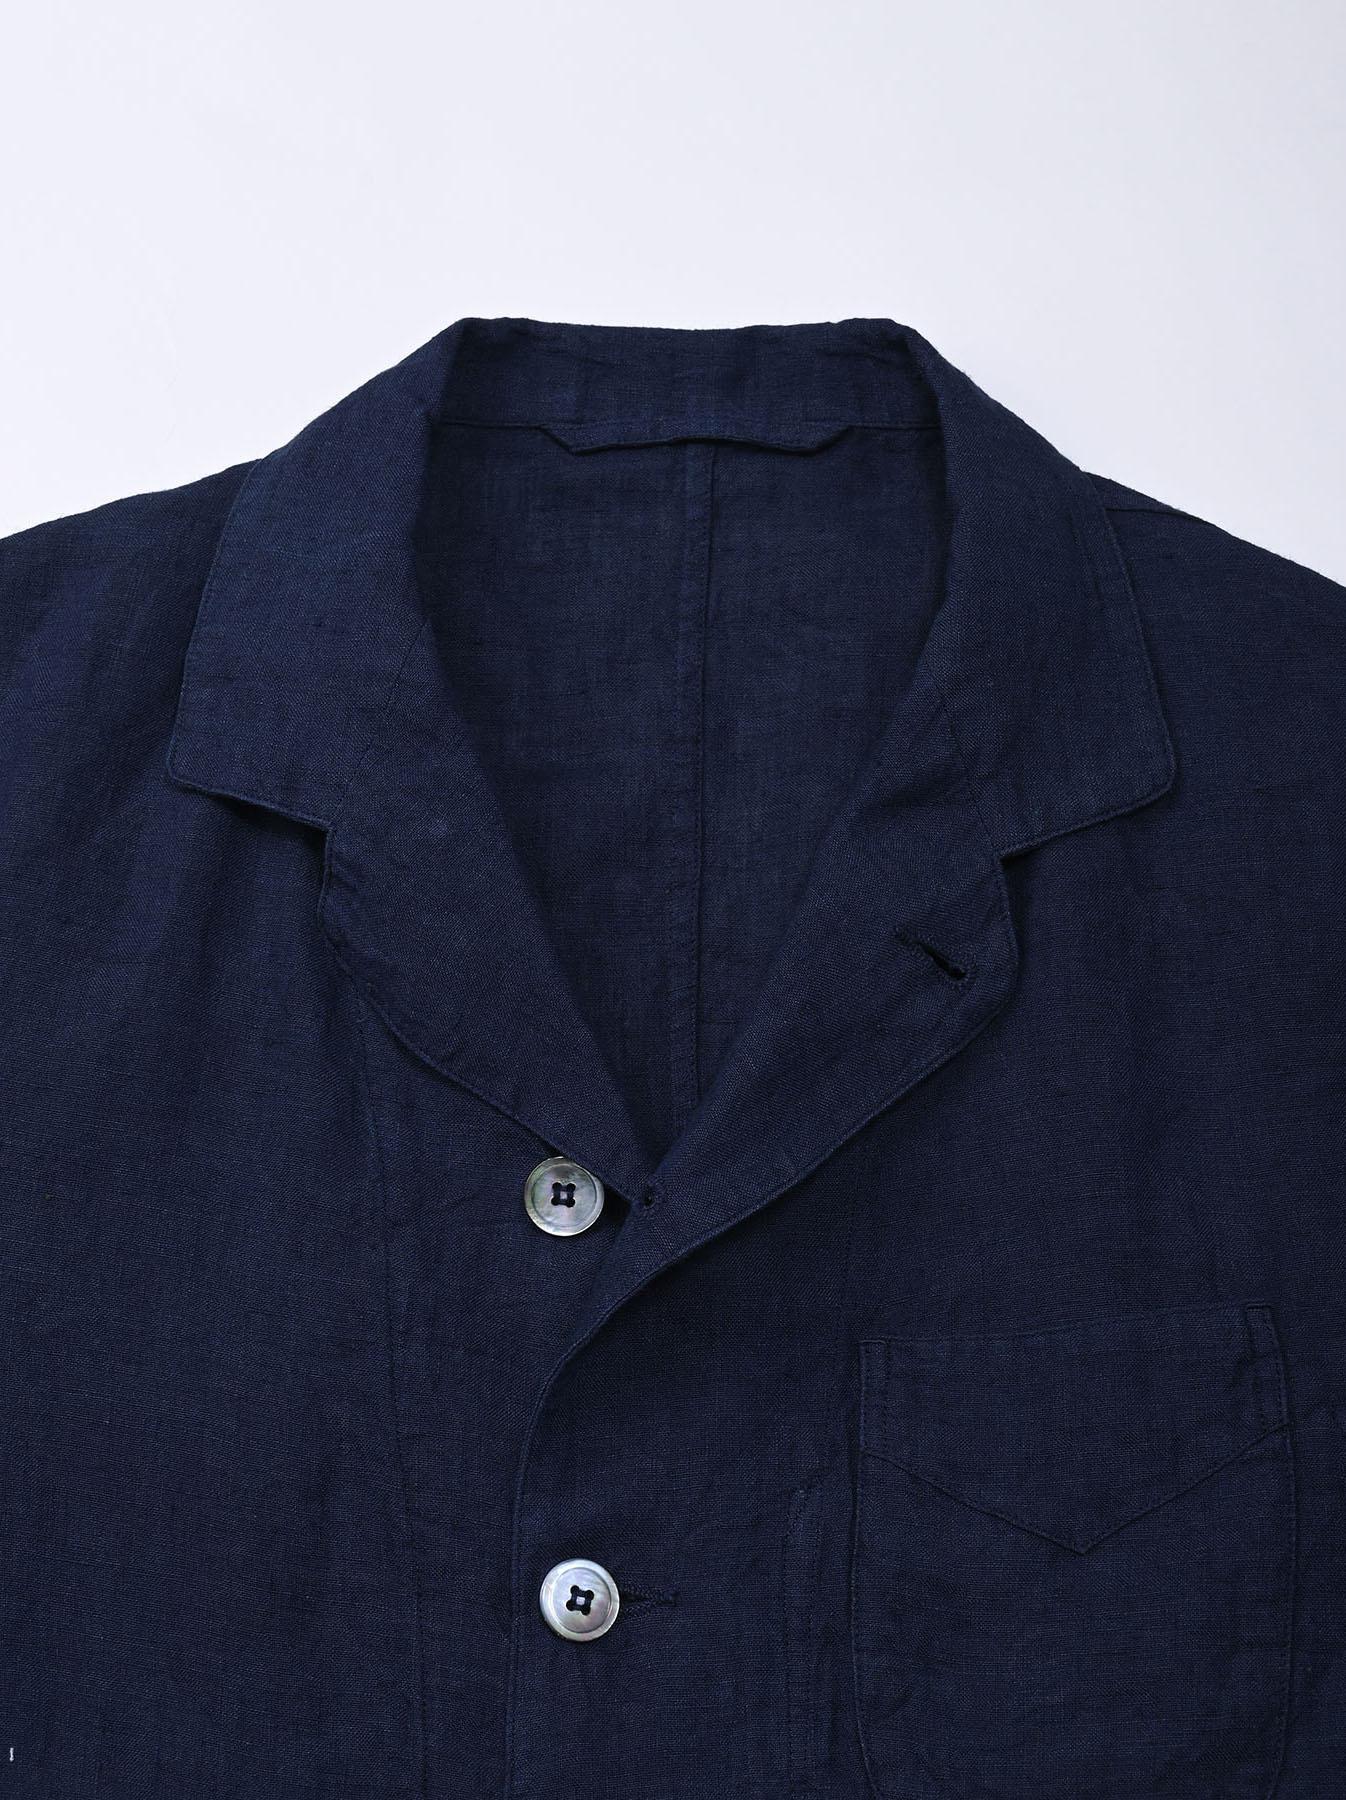 Indigo Indian Linen Flat Shirt Jacket (0521)-6